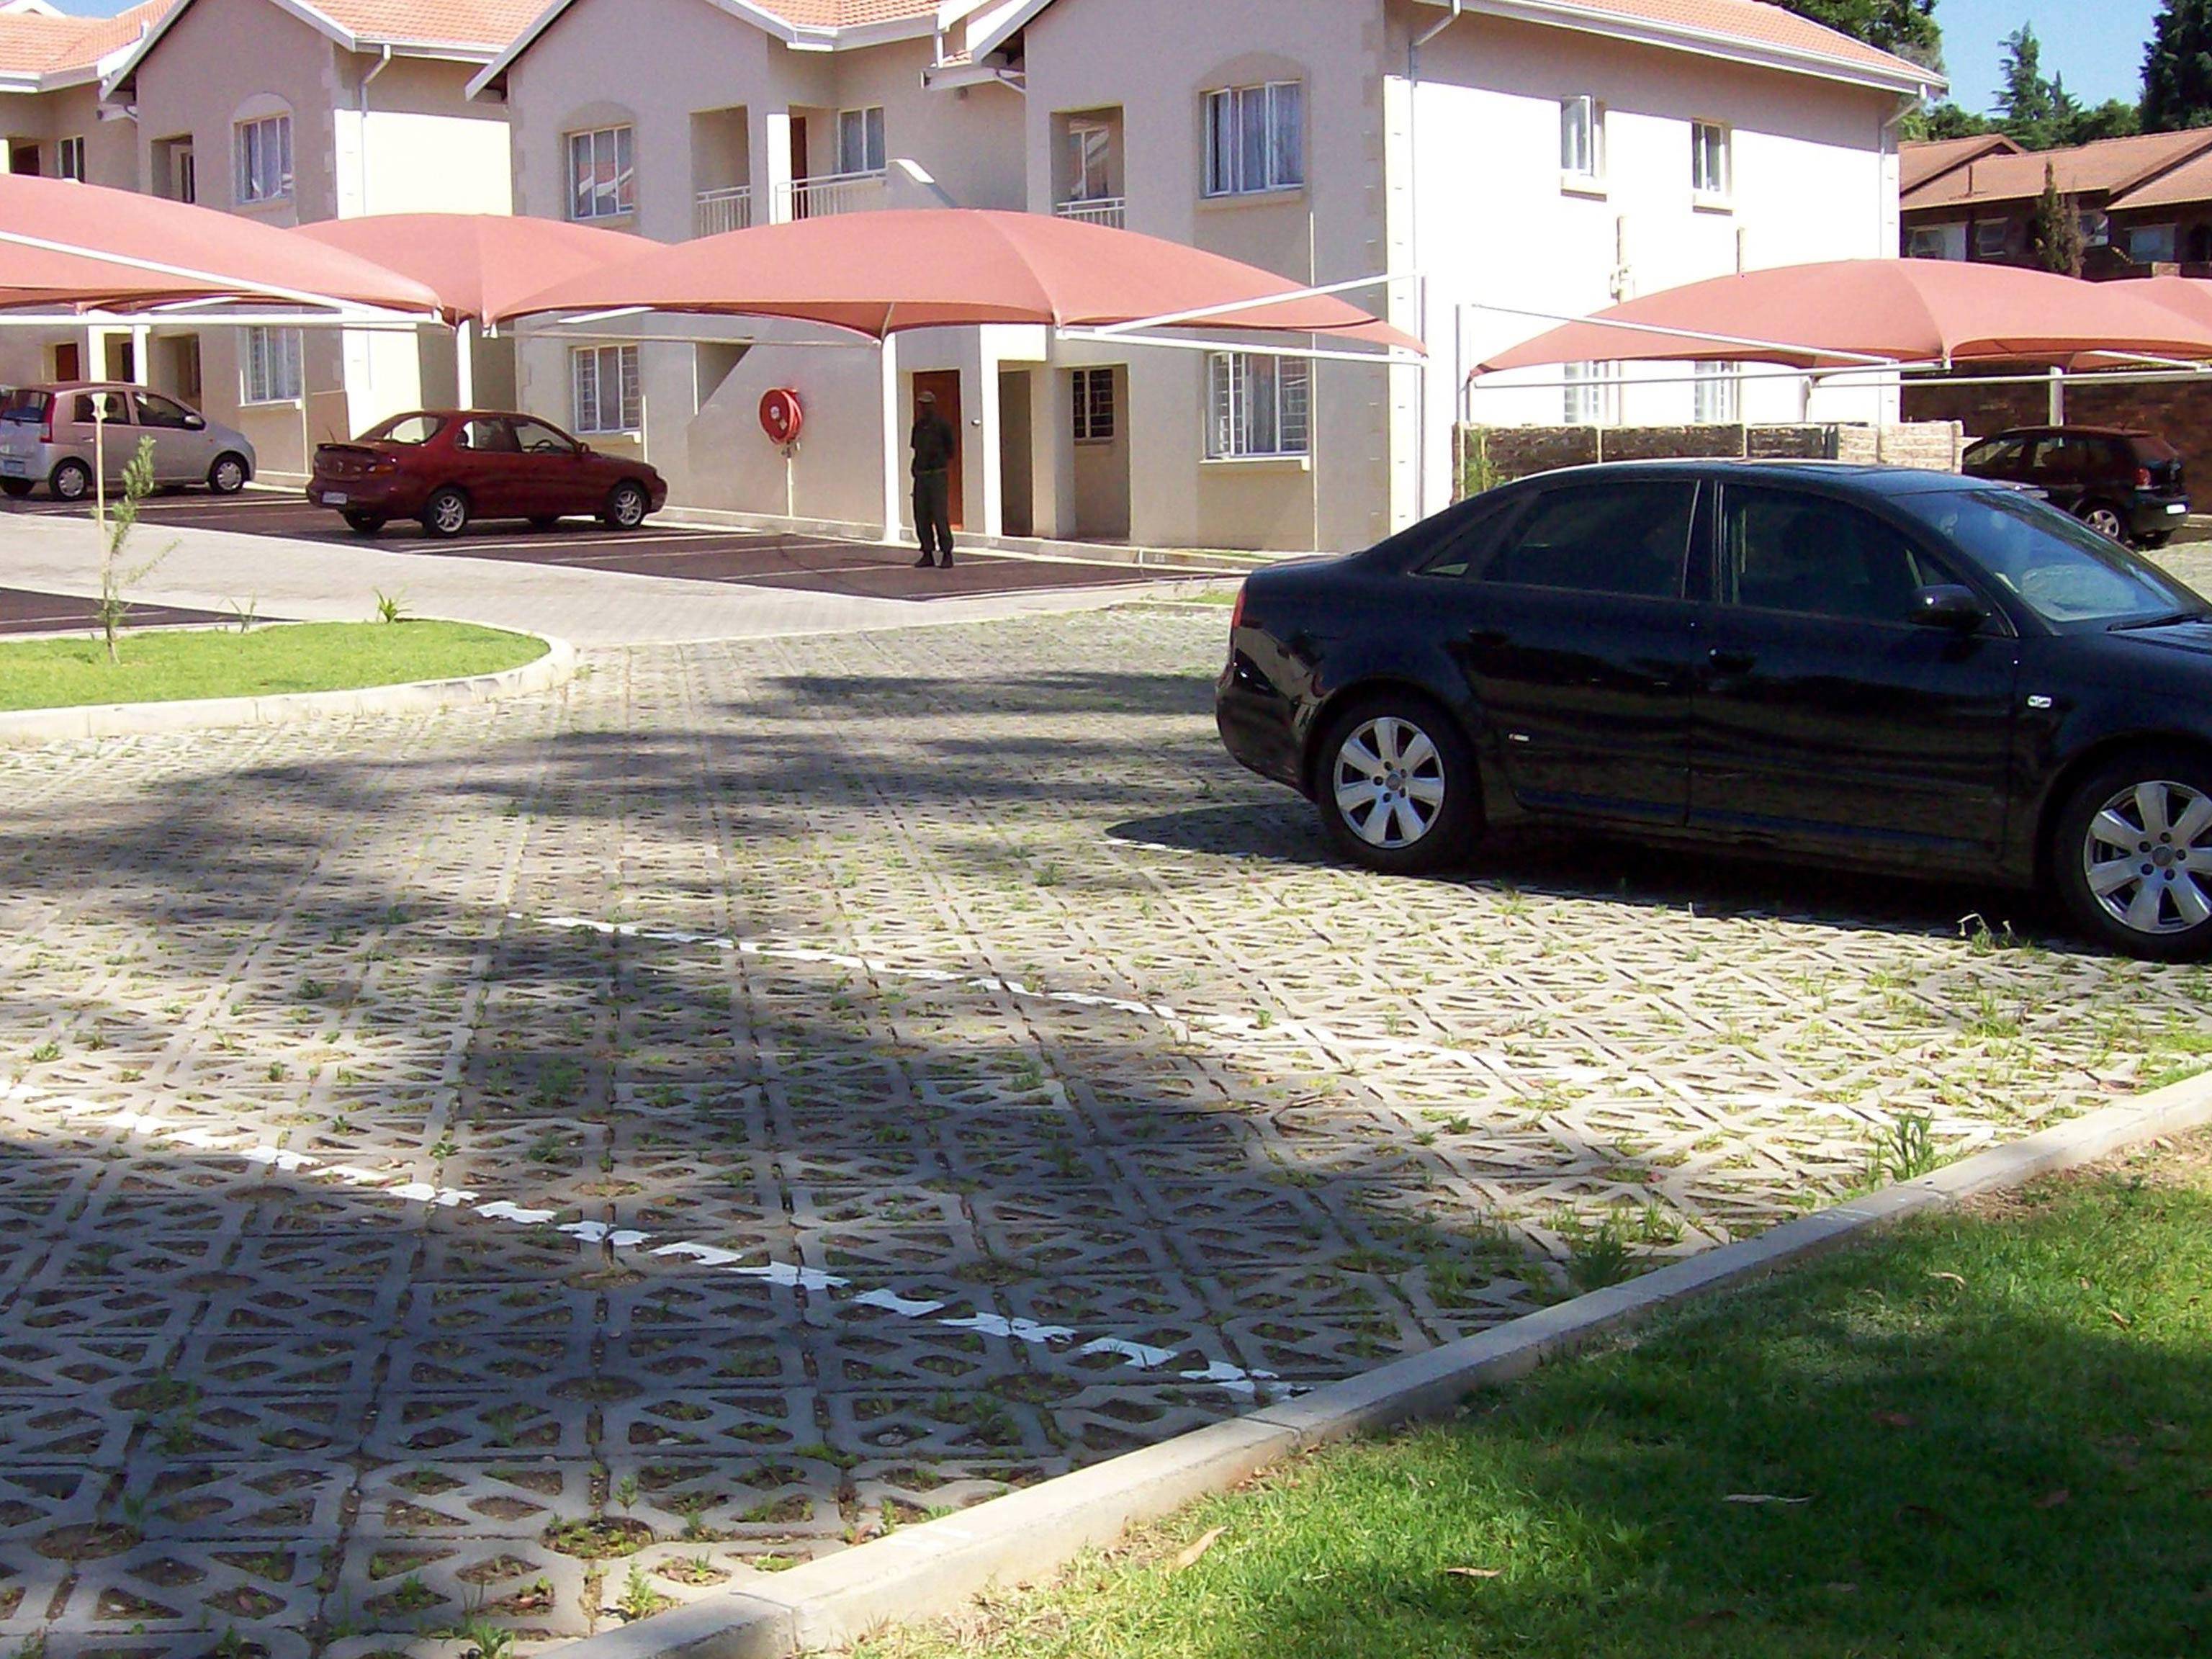 Eco-Friendly Parking Surface with Terracrete